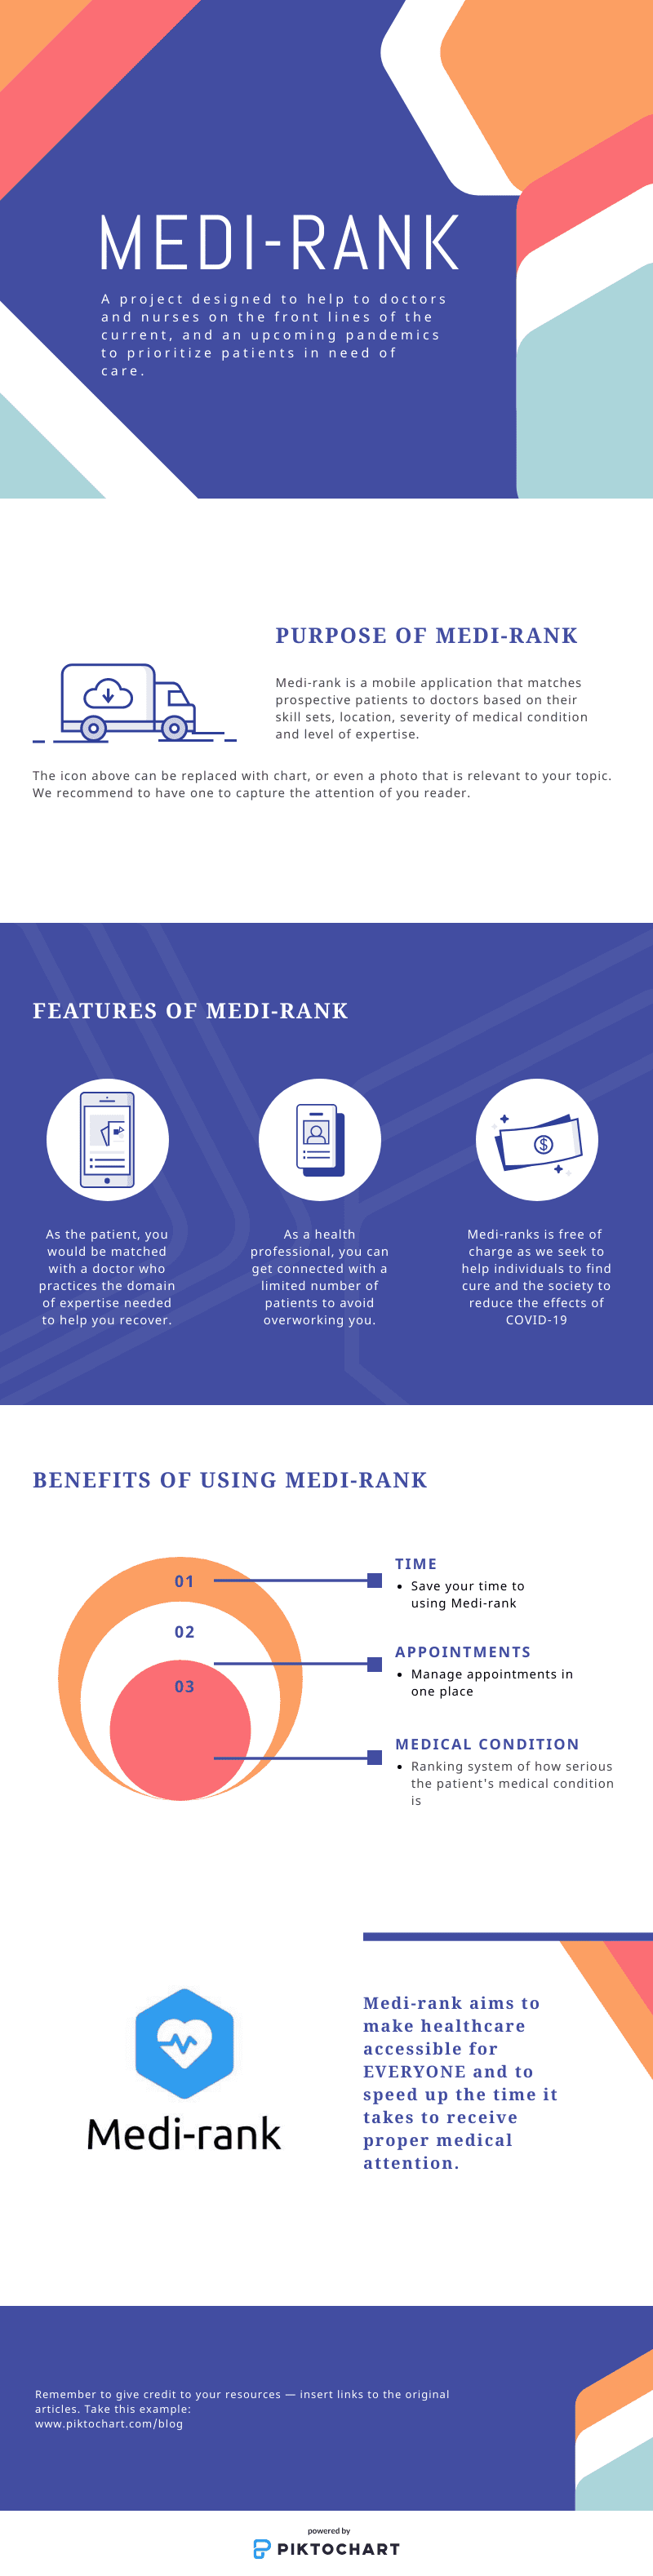 medi-rank_infographic